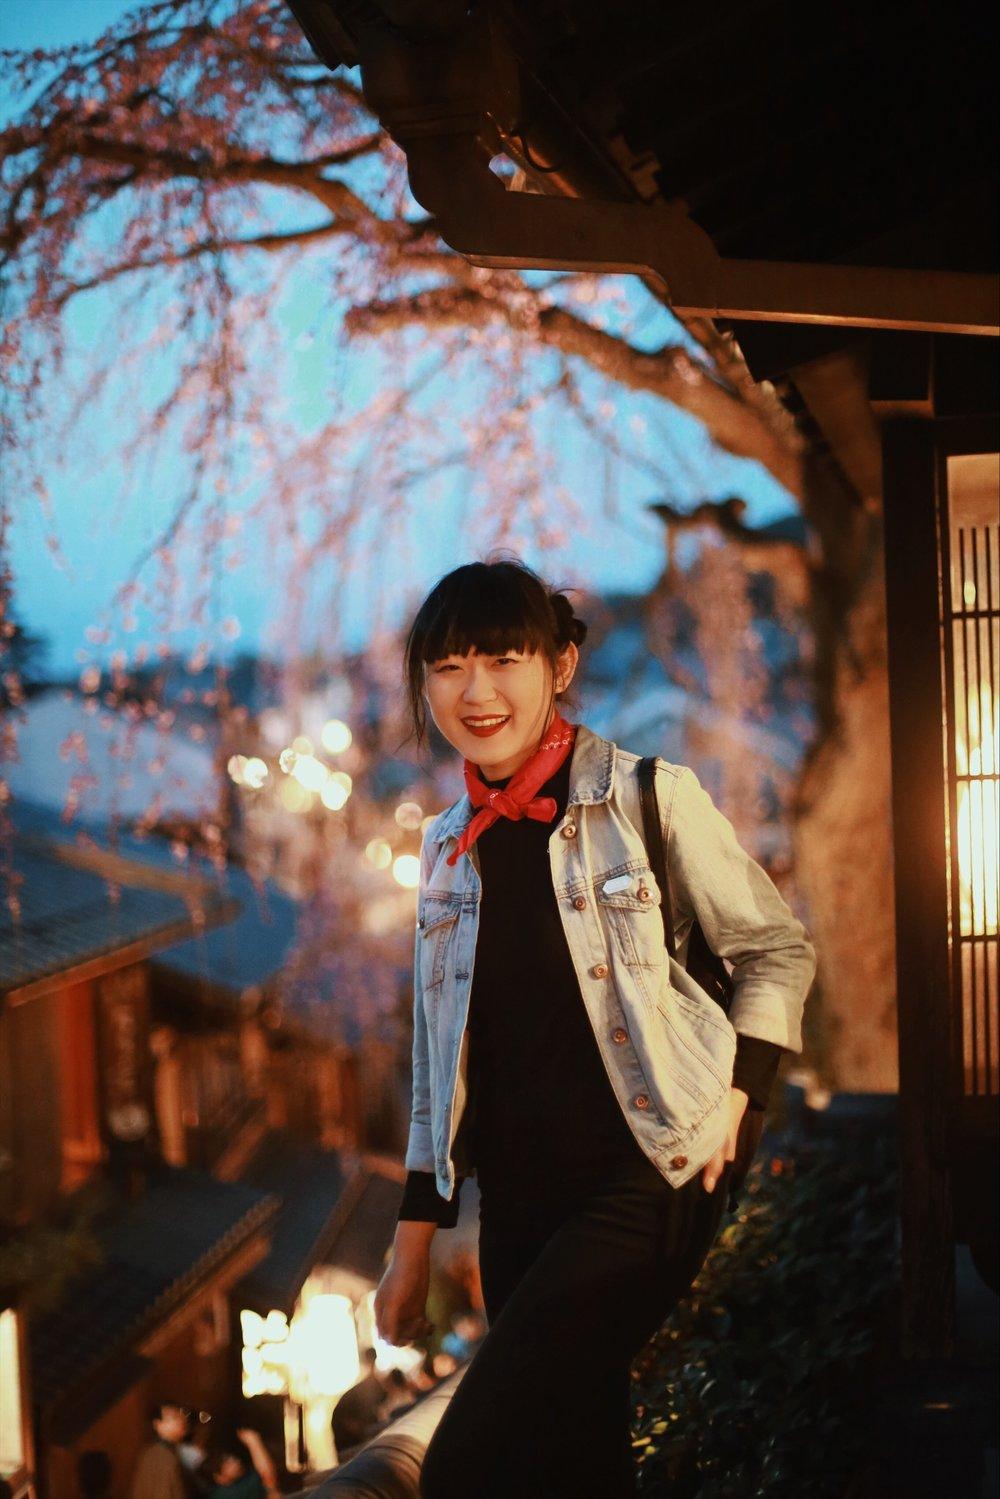 Jen poses by a tree almost in fully cherry blossom splendor overlooking the Ninen-zaka pedestrian street in Higashiyama.